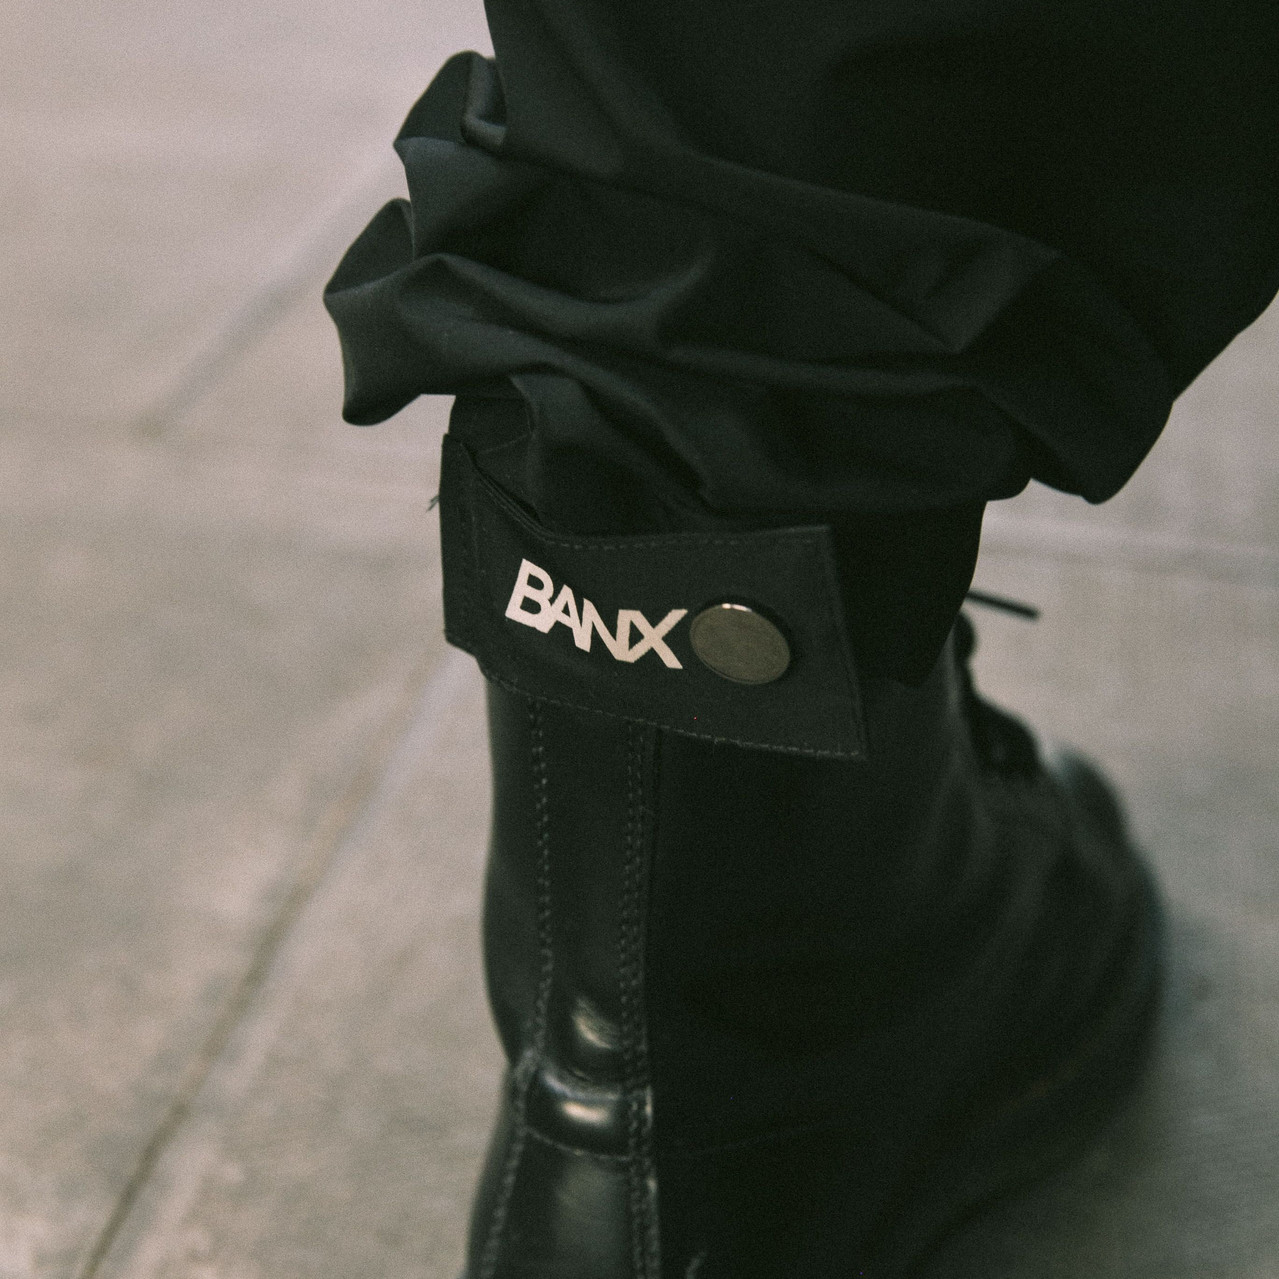 banx3